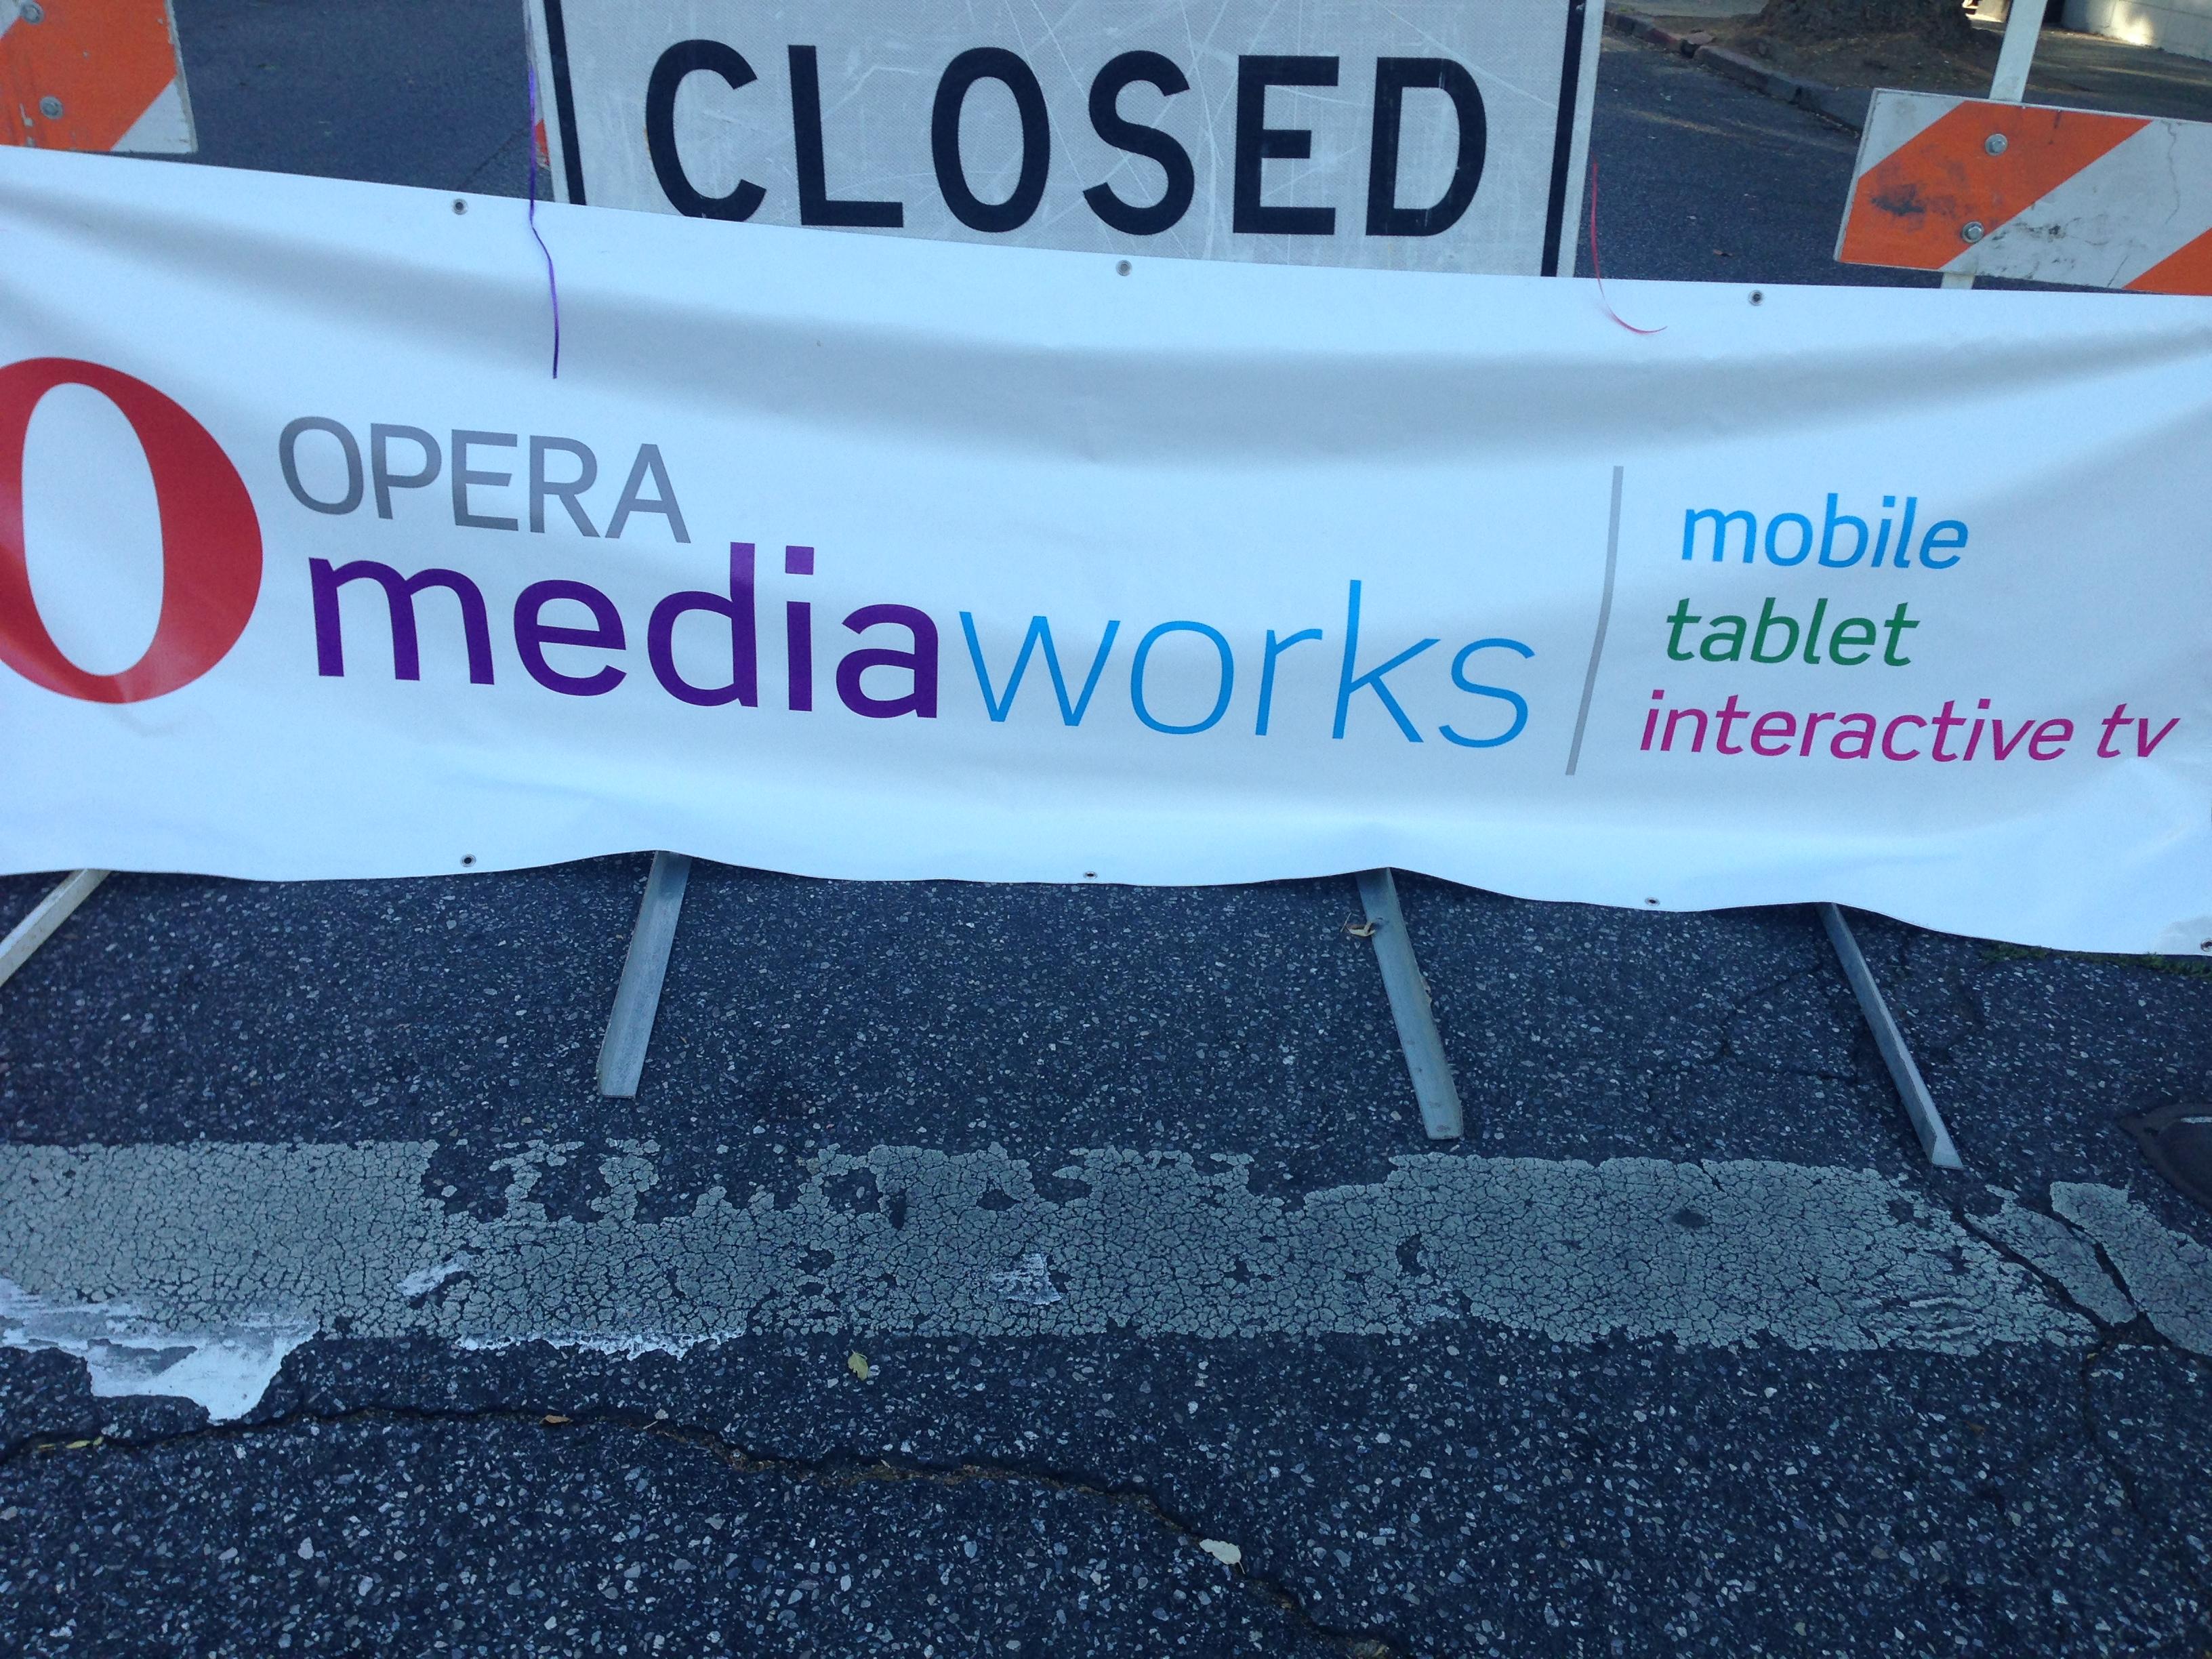 opera.com palo alto street party